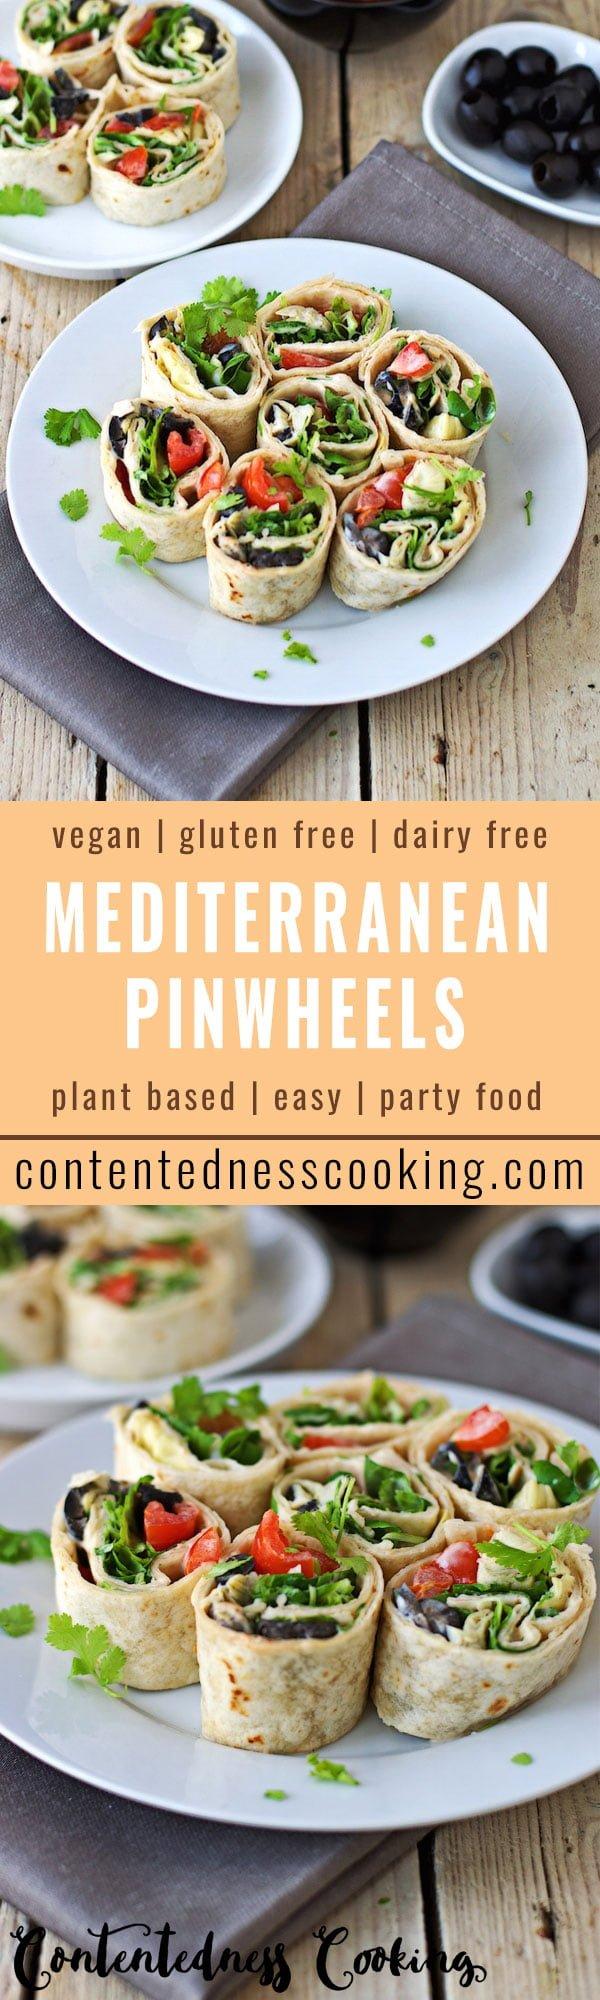 Mediterranean Pinwheels | #vegan #glutenfree #contentednesscooking